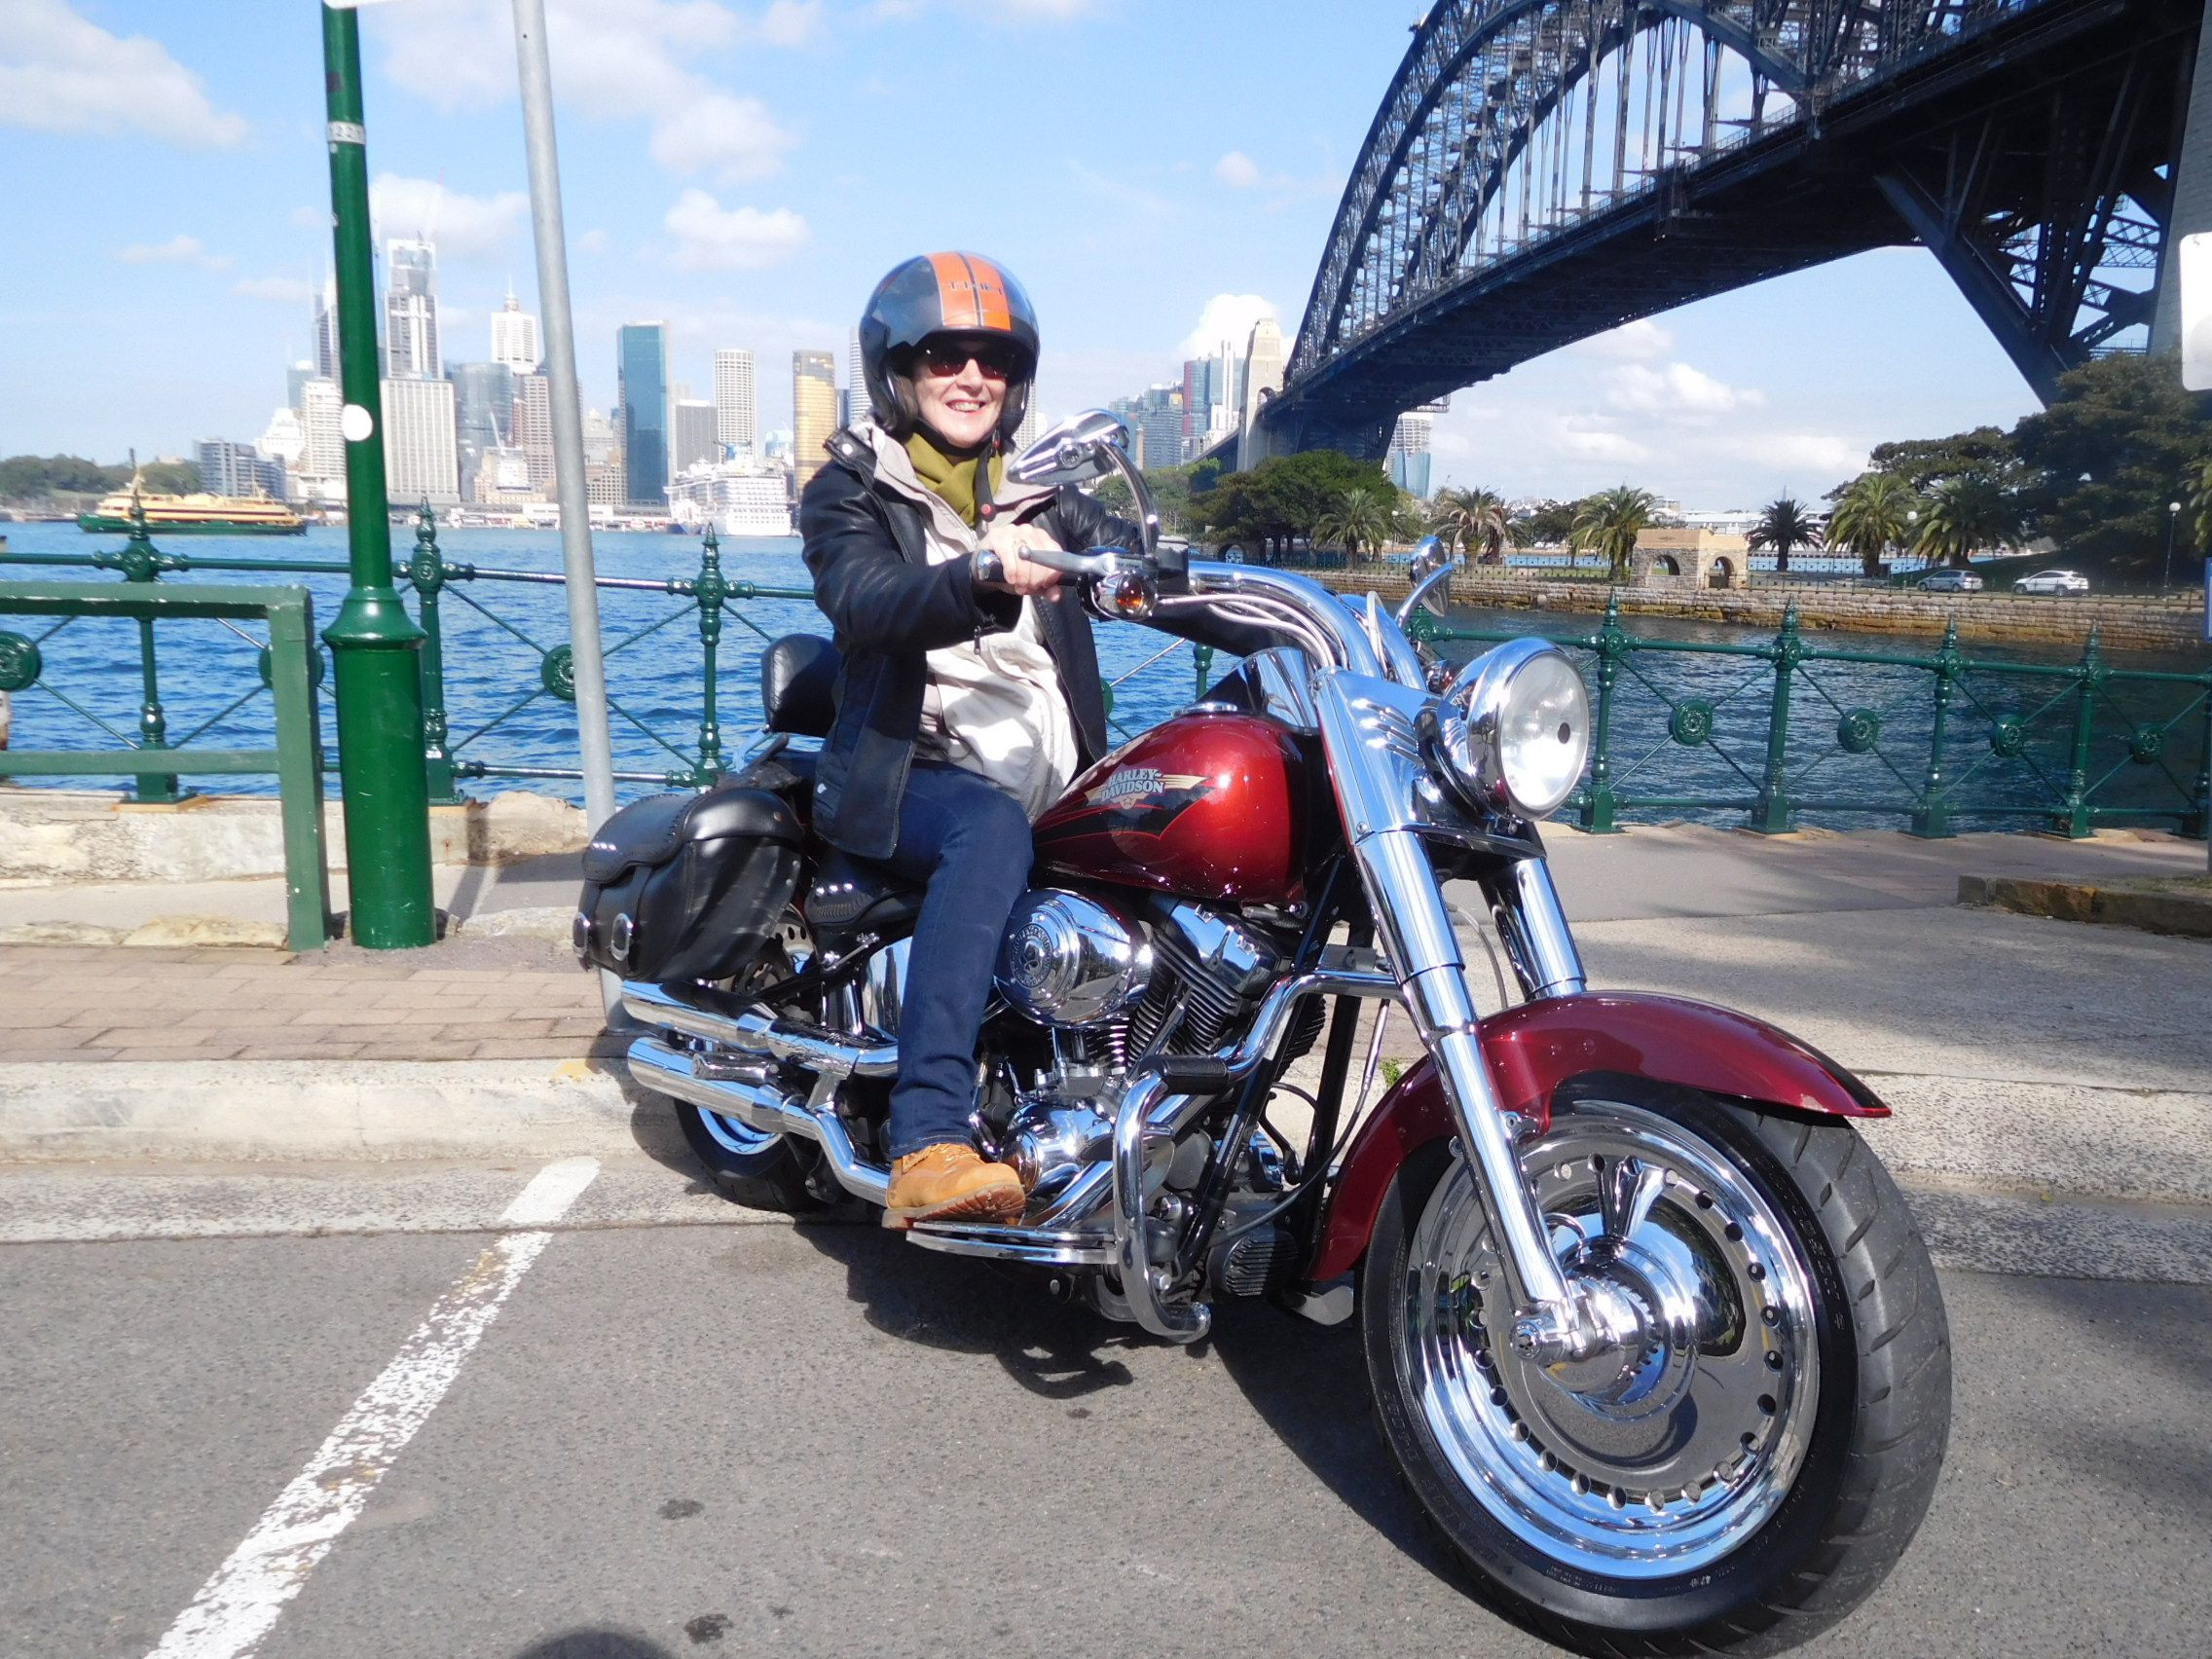 60th birthday Harley tour